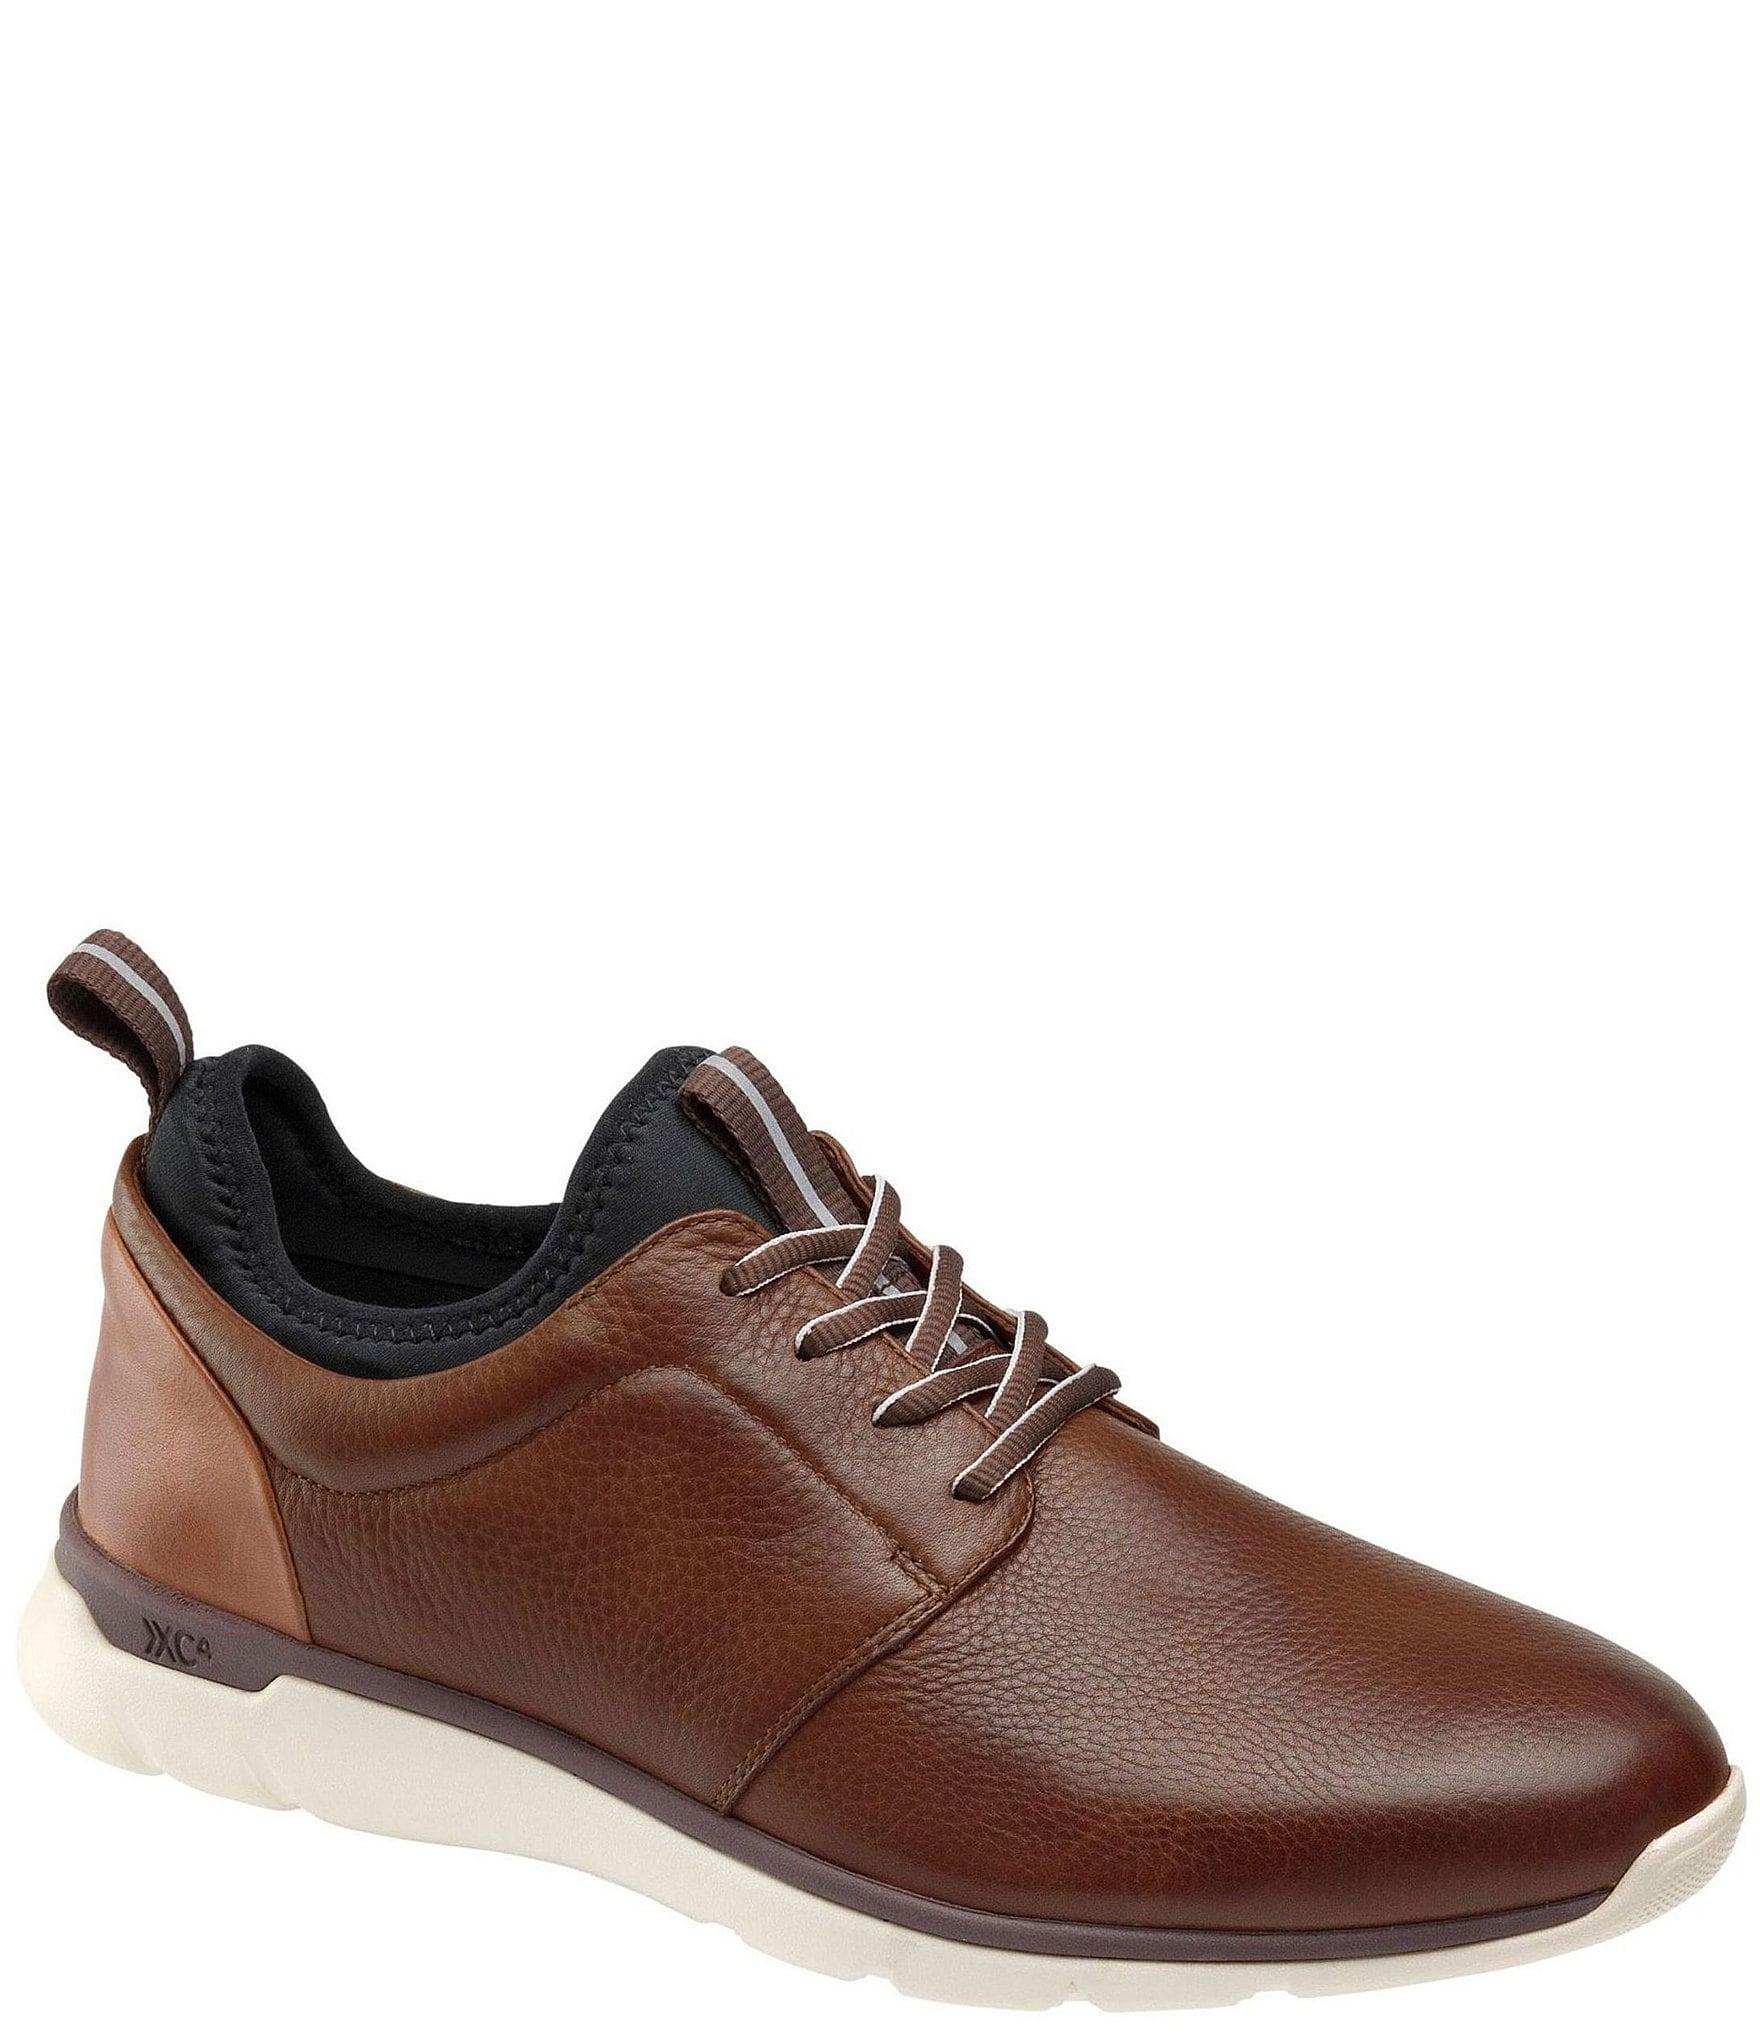 31674e189efc5 Men's Shoes   Dillard's